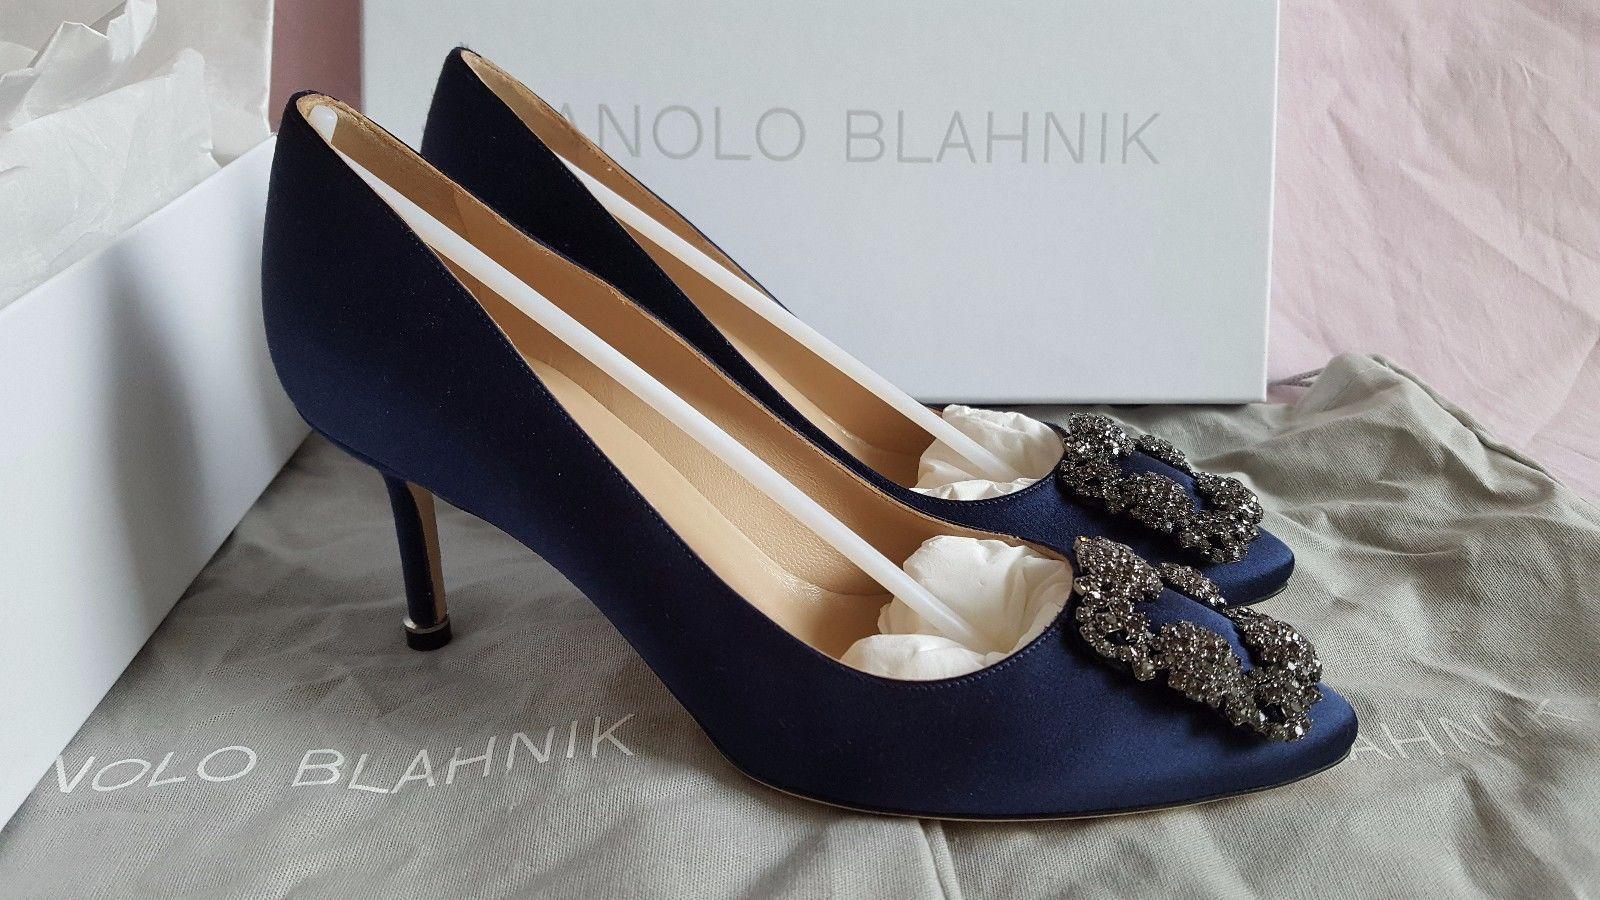 664bce174a7 New Authentic Manolo Blahnik Hangisi 70 Navy Blue Satin Shoes Heels Pump FMC